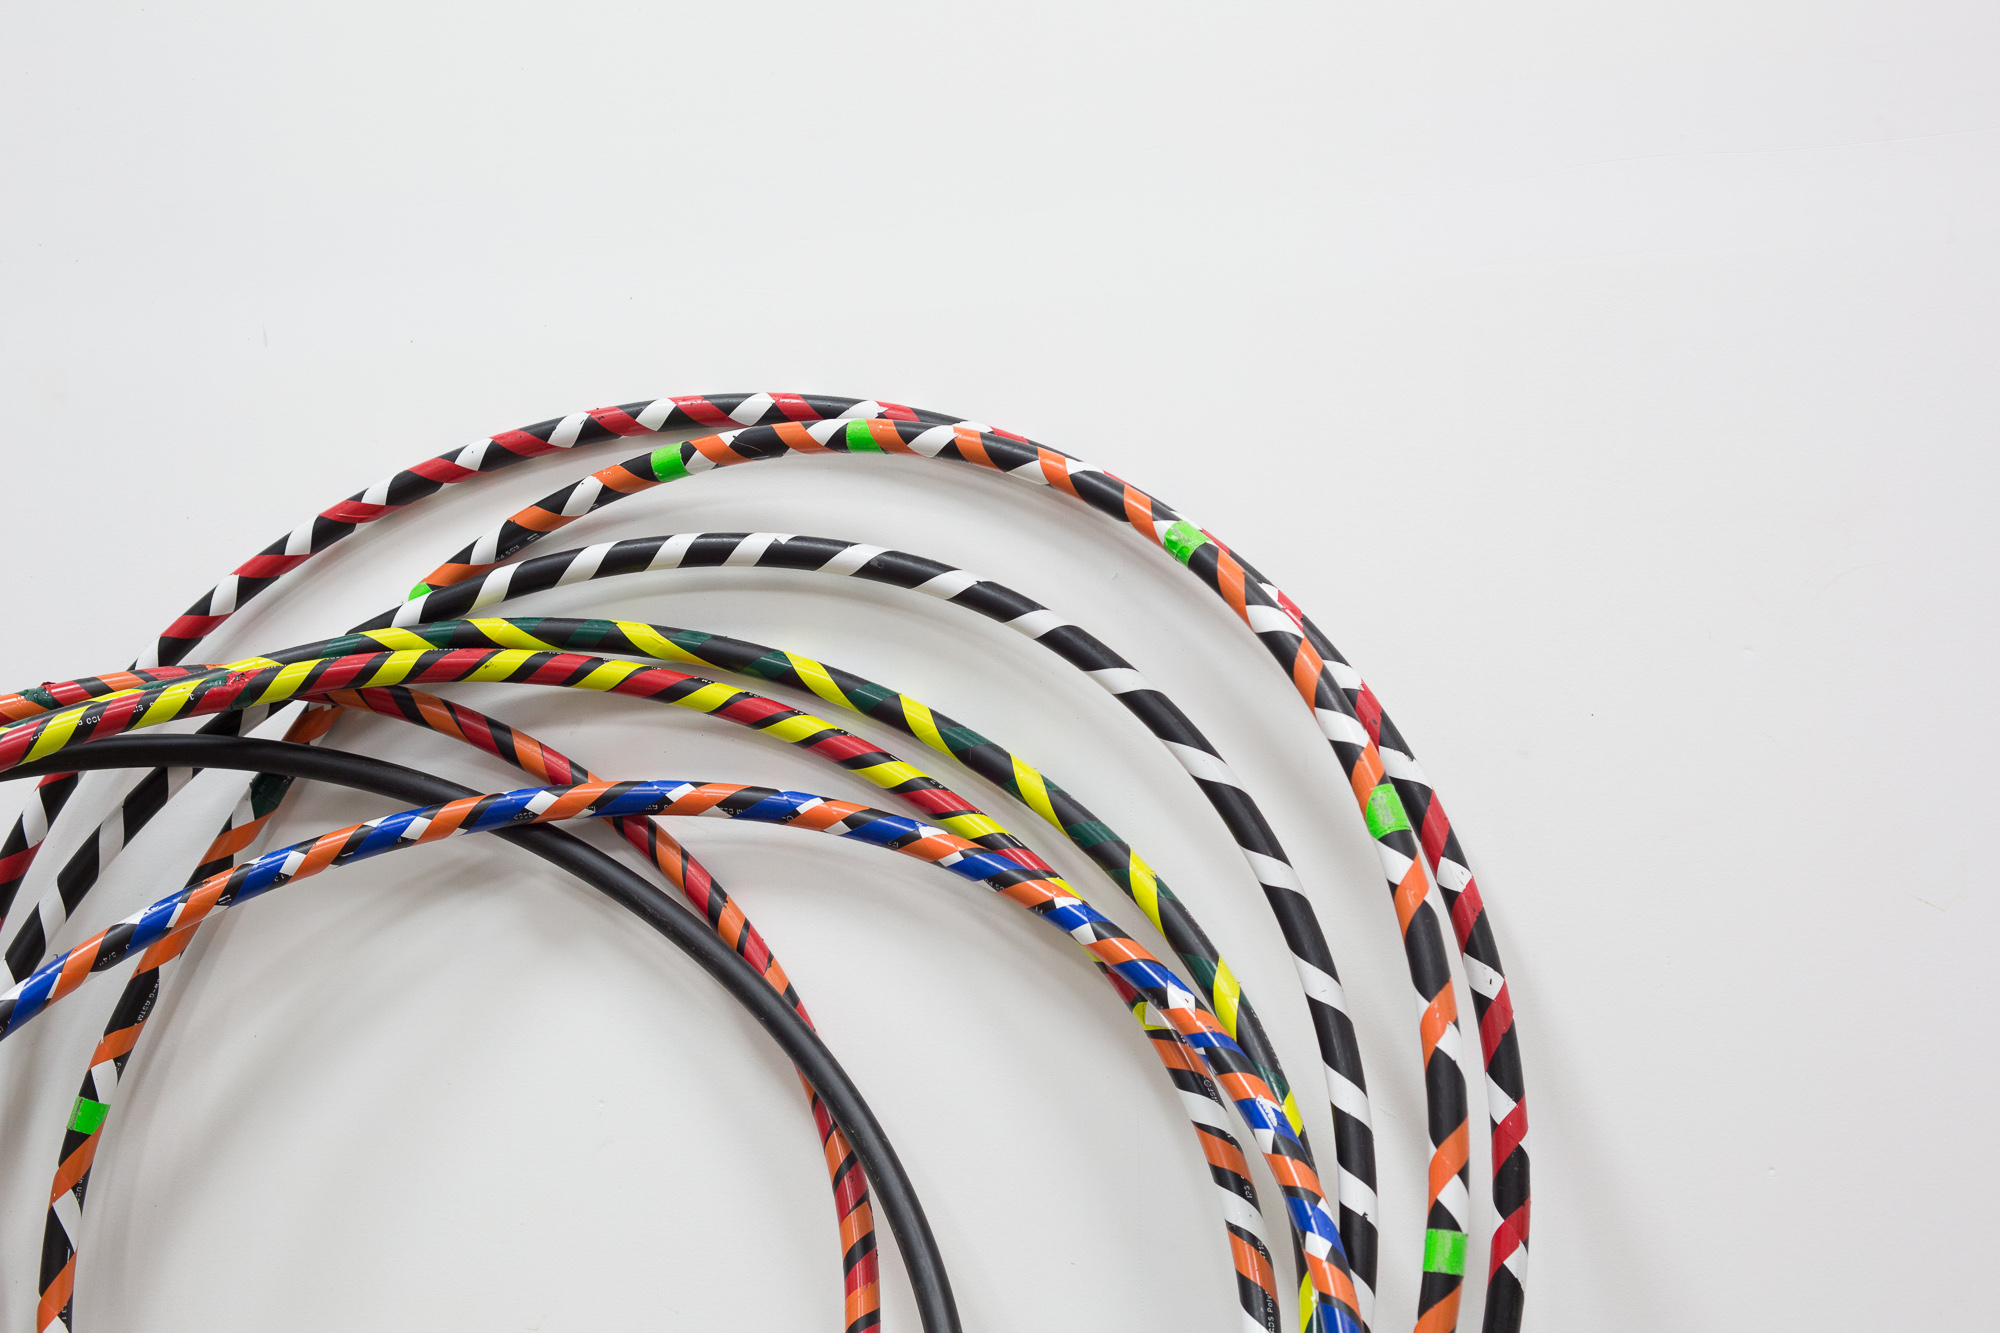 How to Make a DIY Hula Hoop